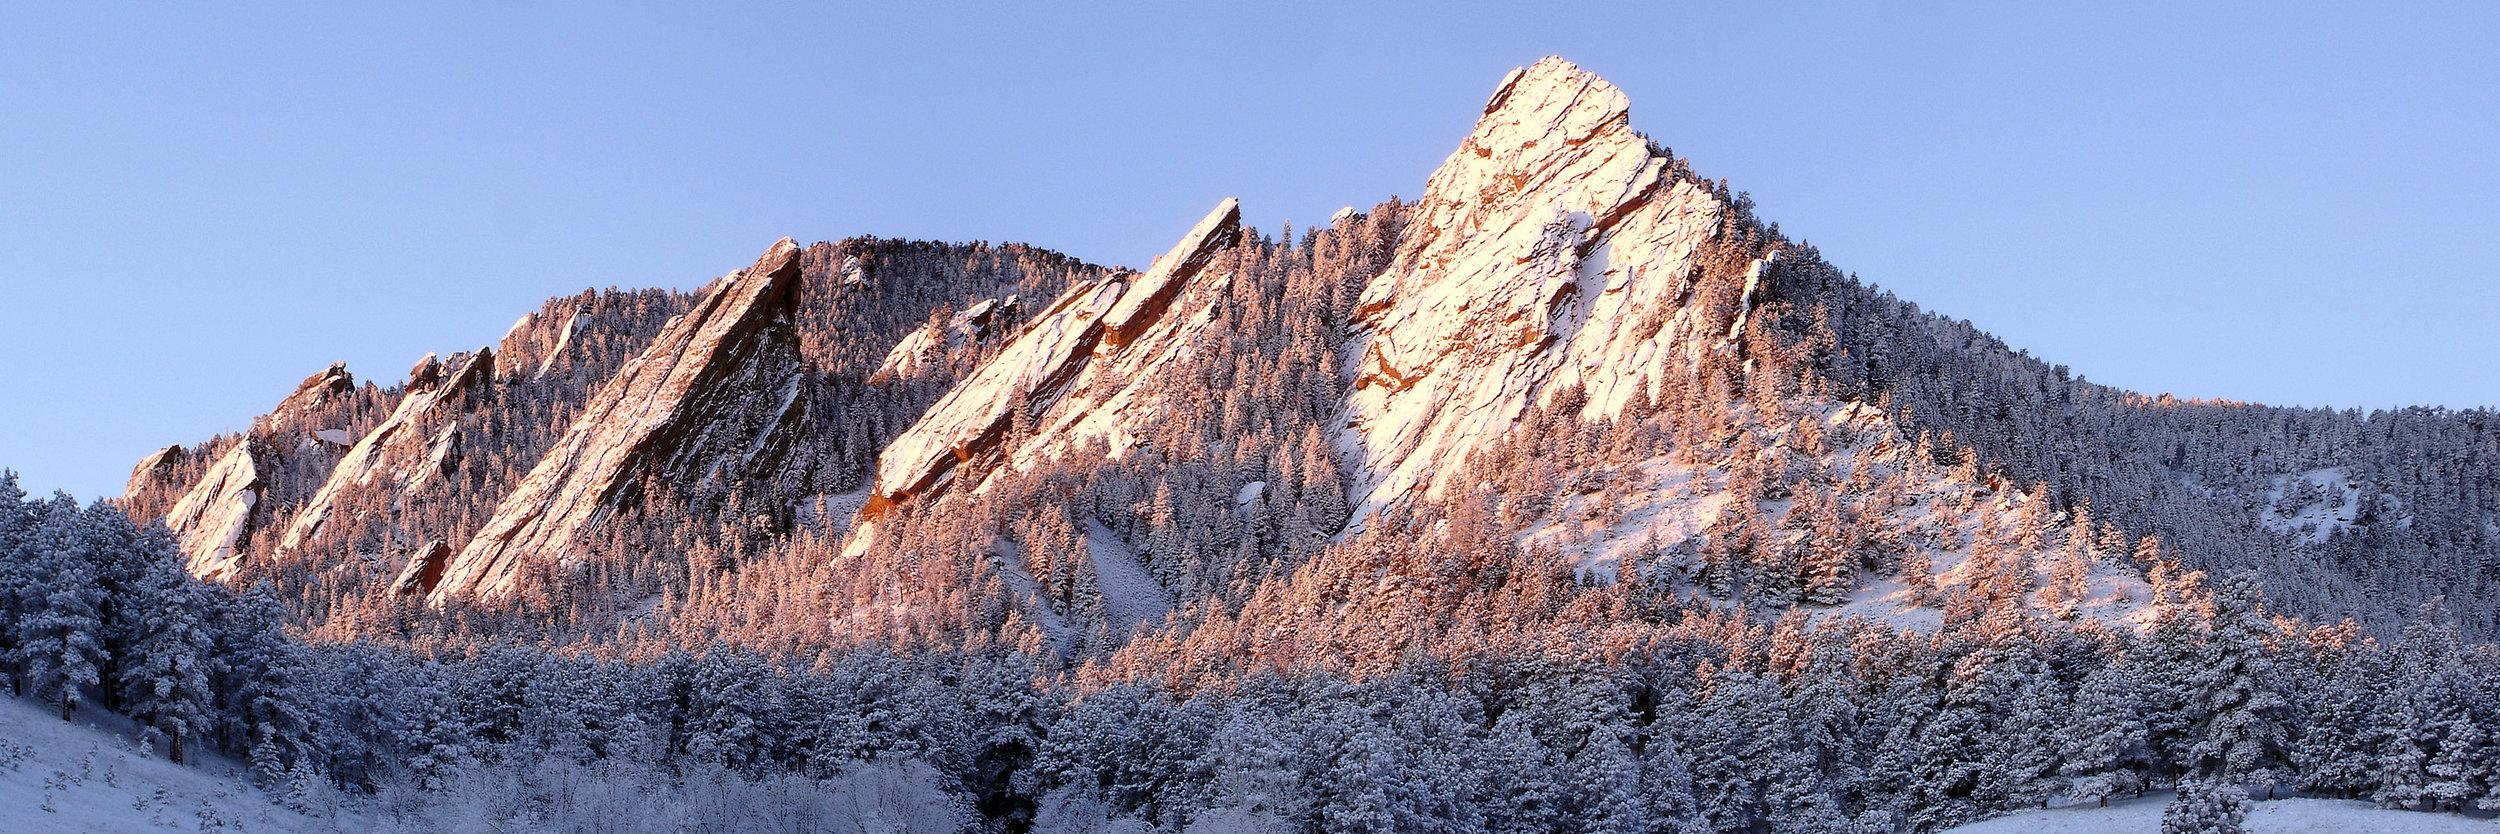 The Flatirons, rock formations near Boulder, Colorado.